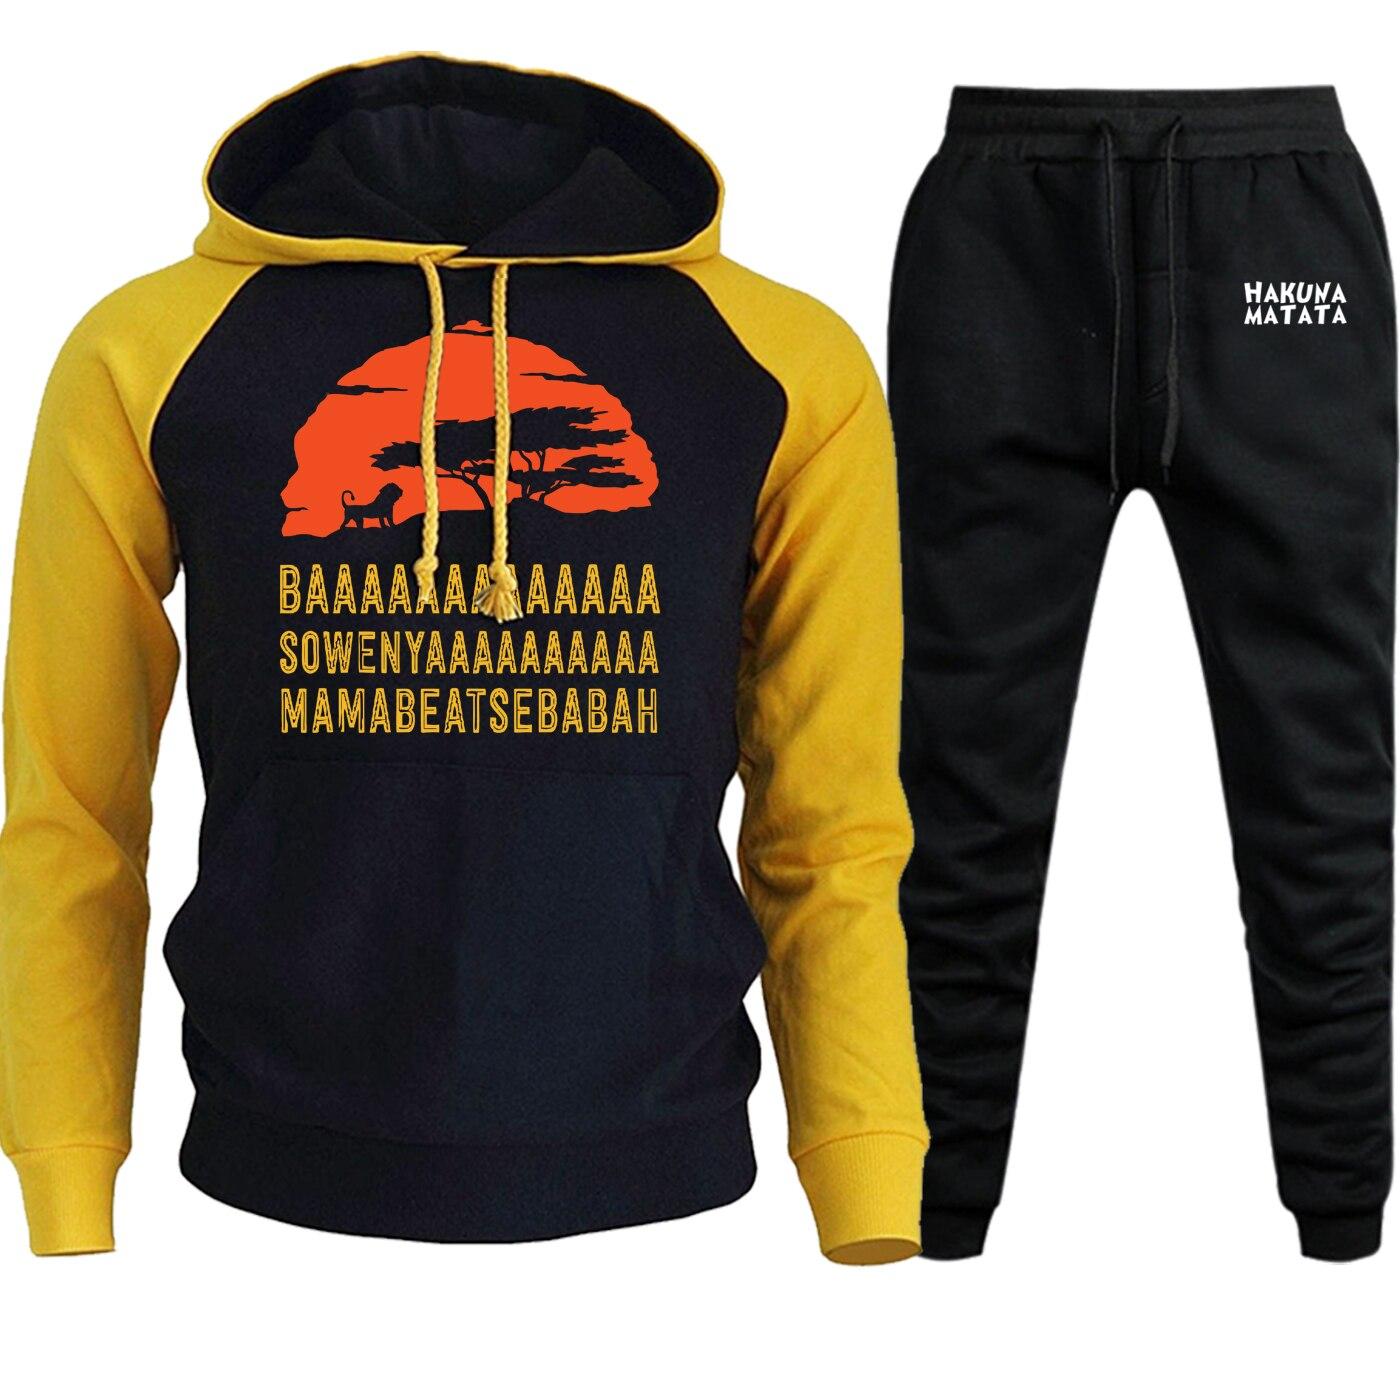 Autumn New 2019 Streetwear Mens Hoodie Raglan The Lion King Cartoon Print Suit Male Casual Pullover Hooded+Pants 2 Piece Set